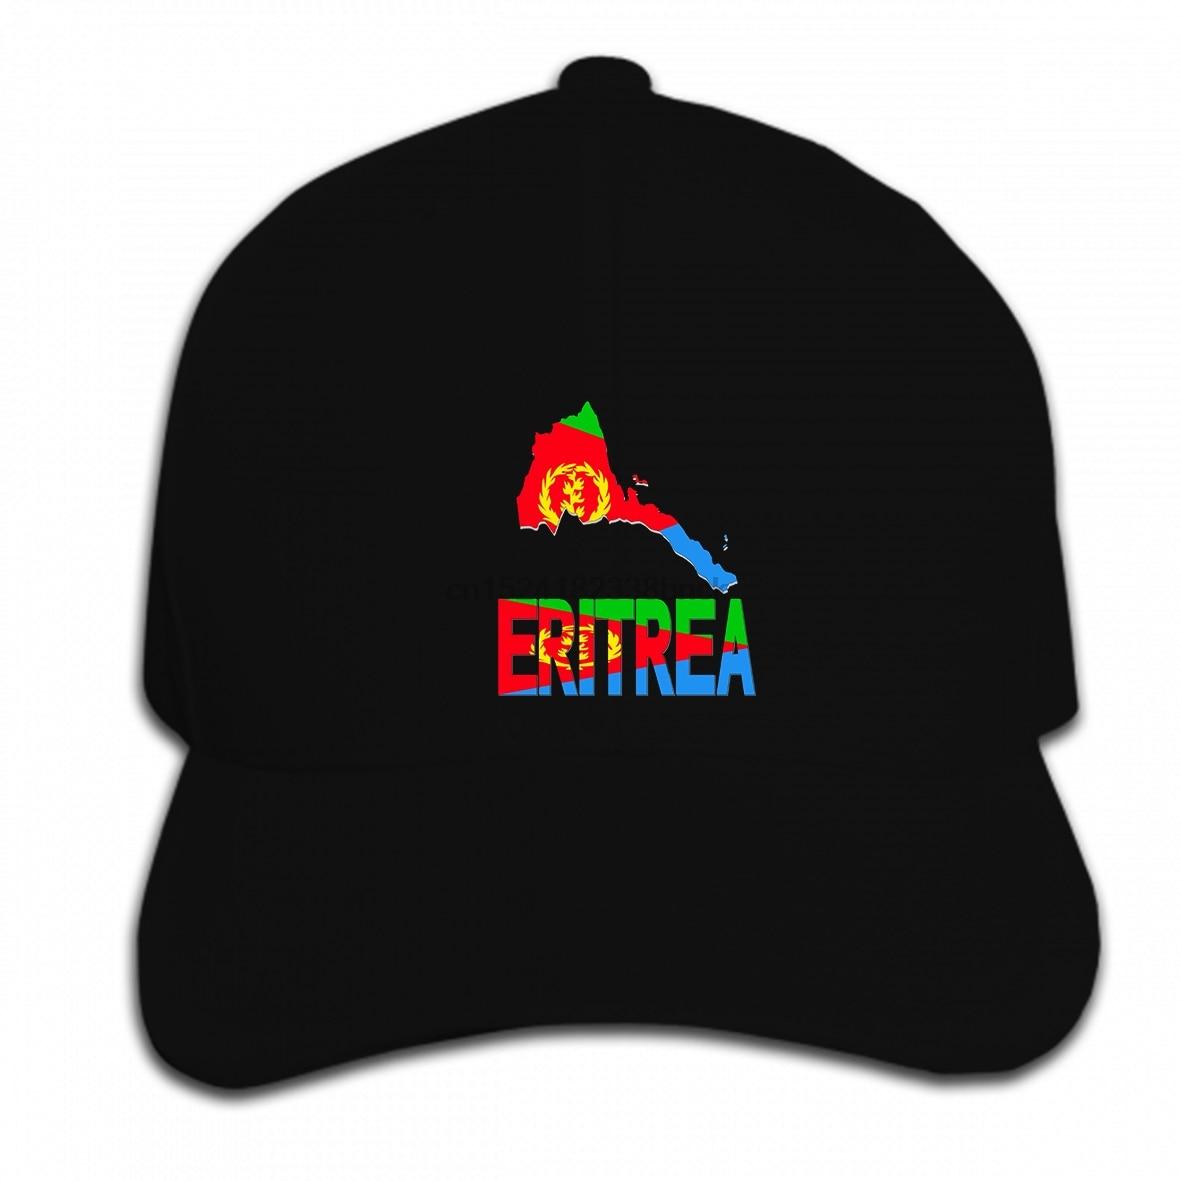 Print Custom Baseball Cap Hip Hop Funny men novelty women Eritrea map Eritrean flag Africa Hat Peaked cap